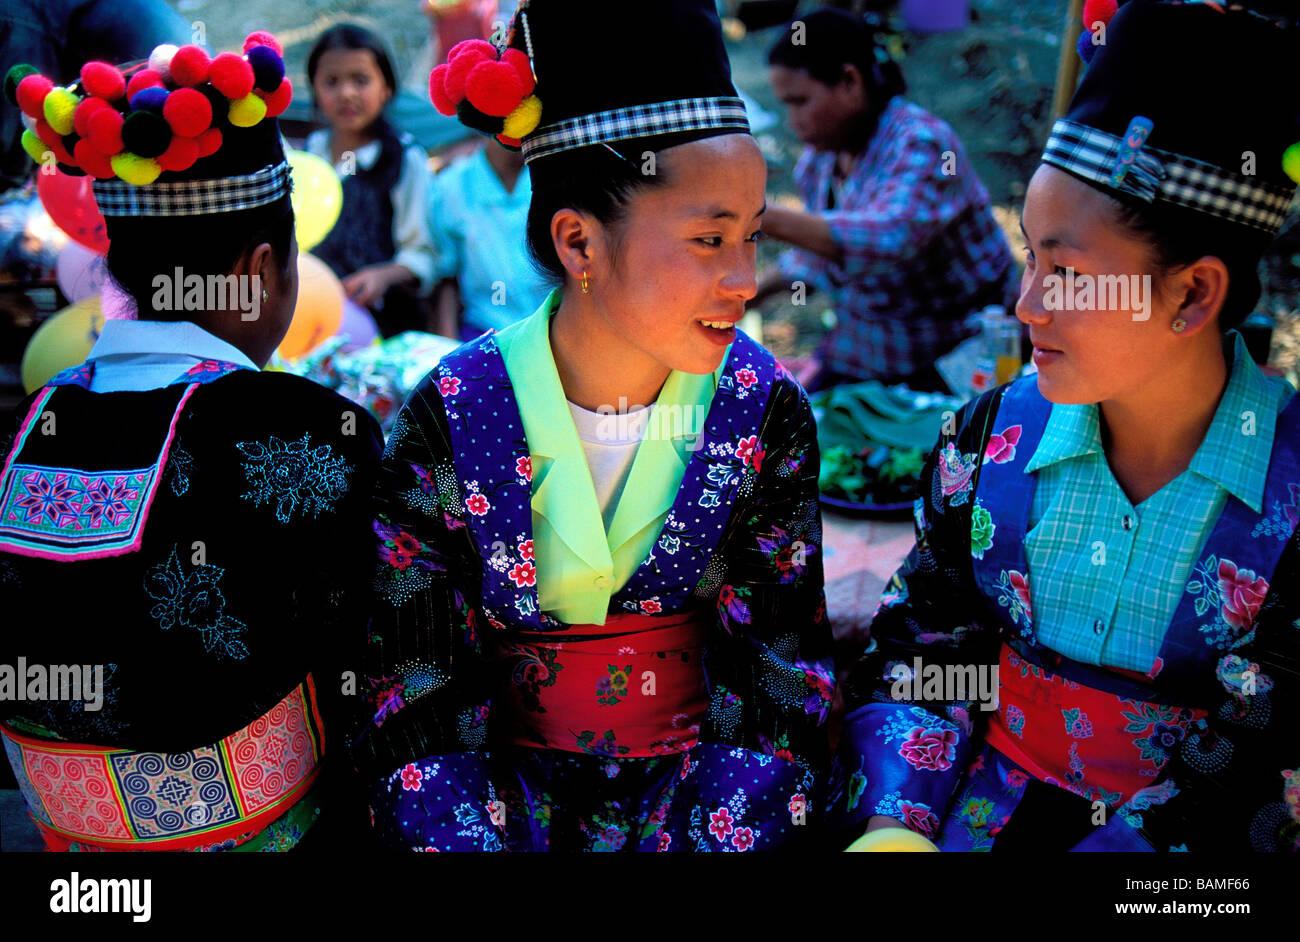 Laos, Luang Prabang, Hmong minority, Hmong women talking - Stock Image